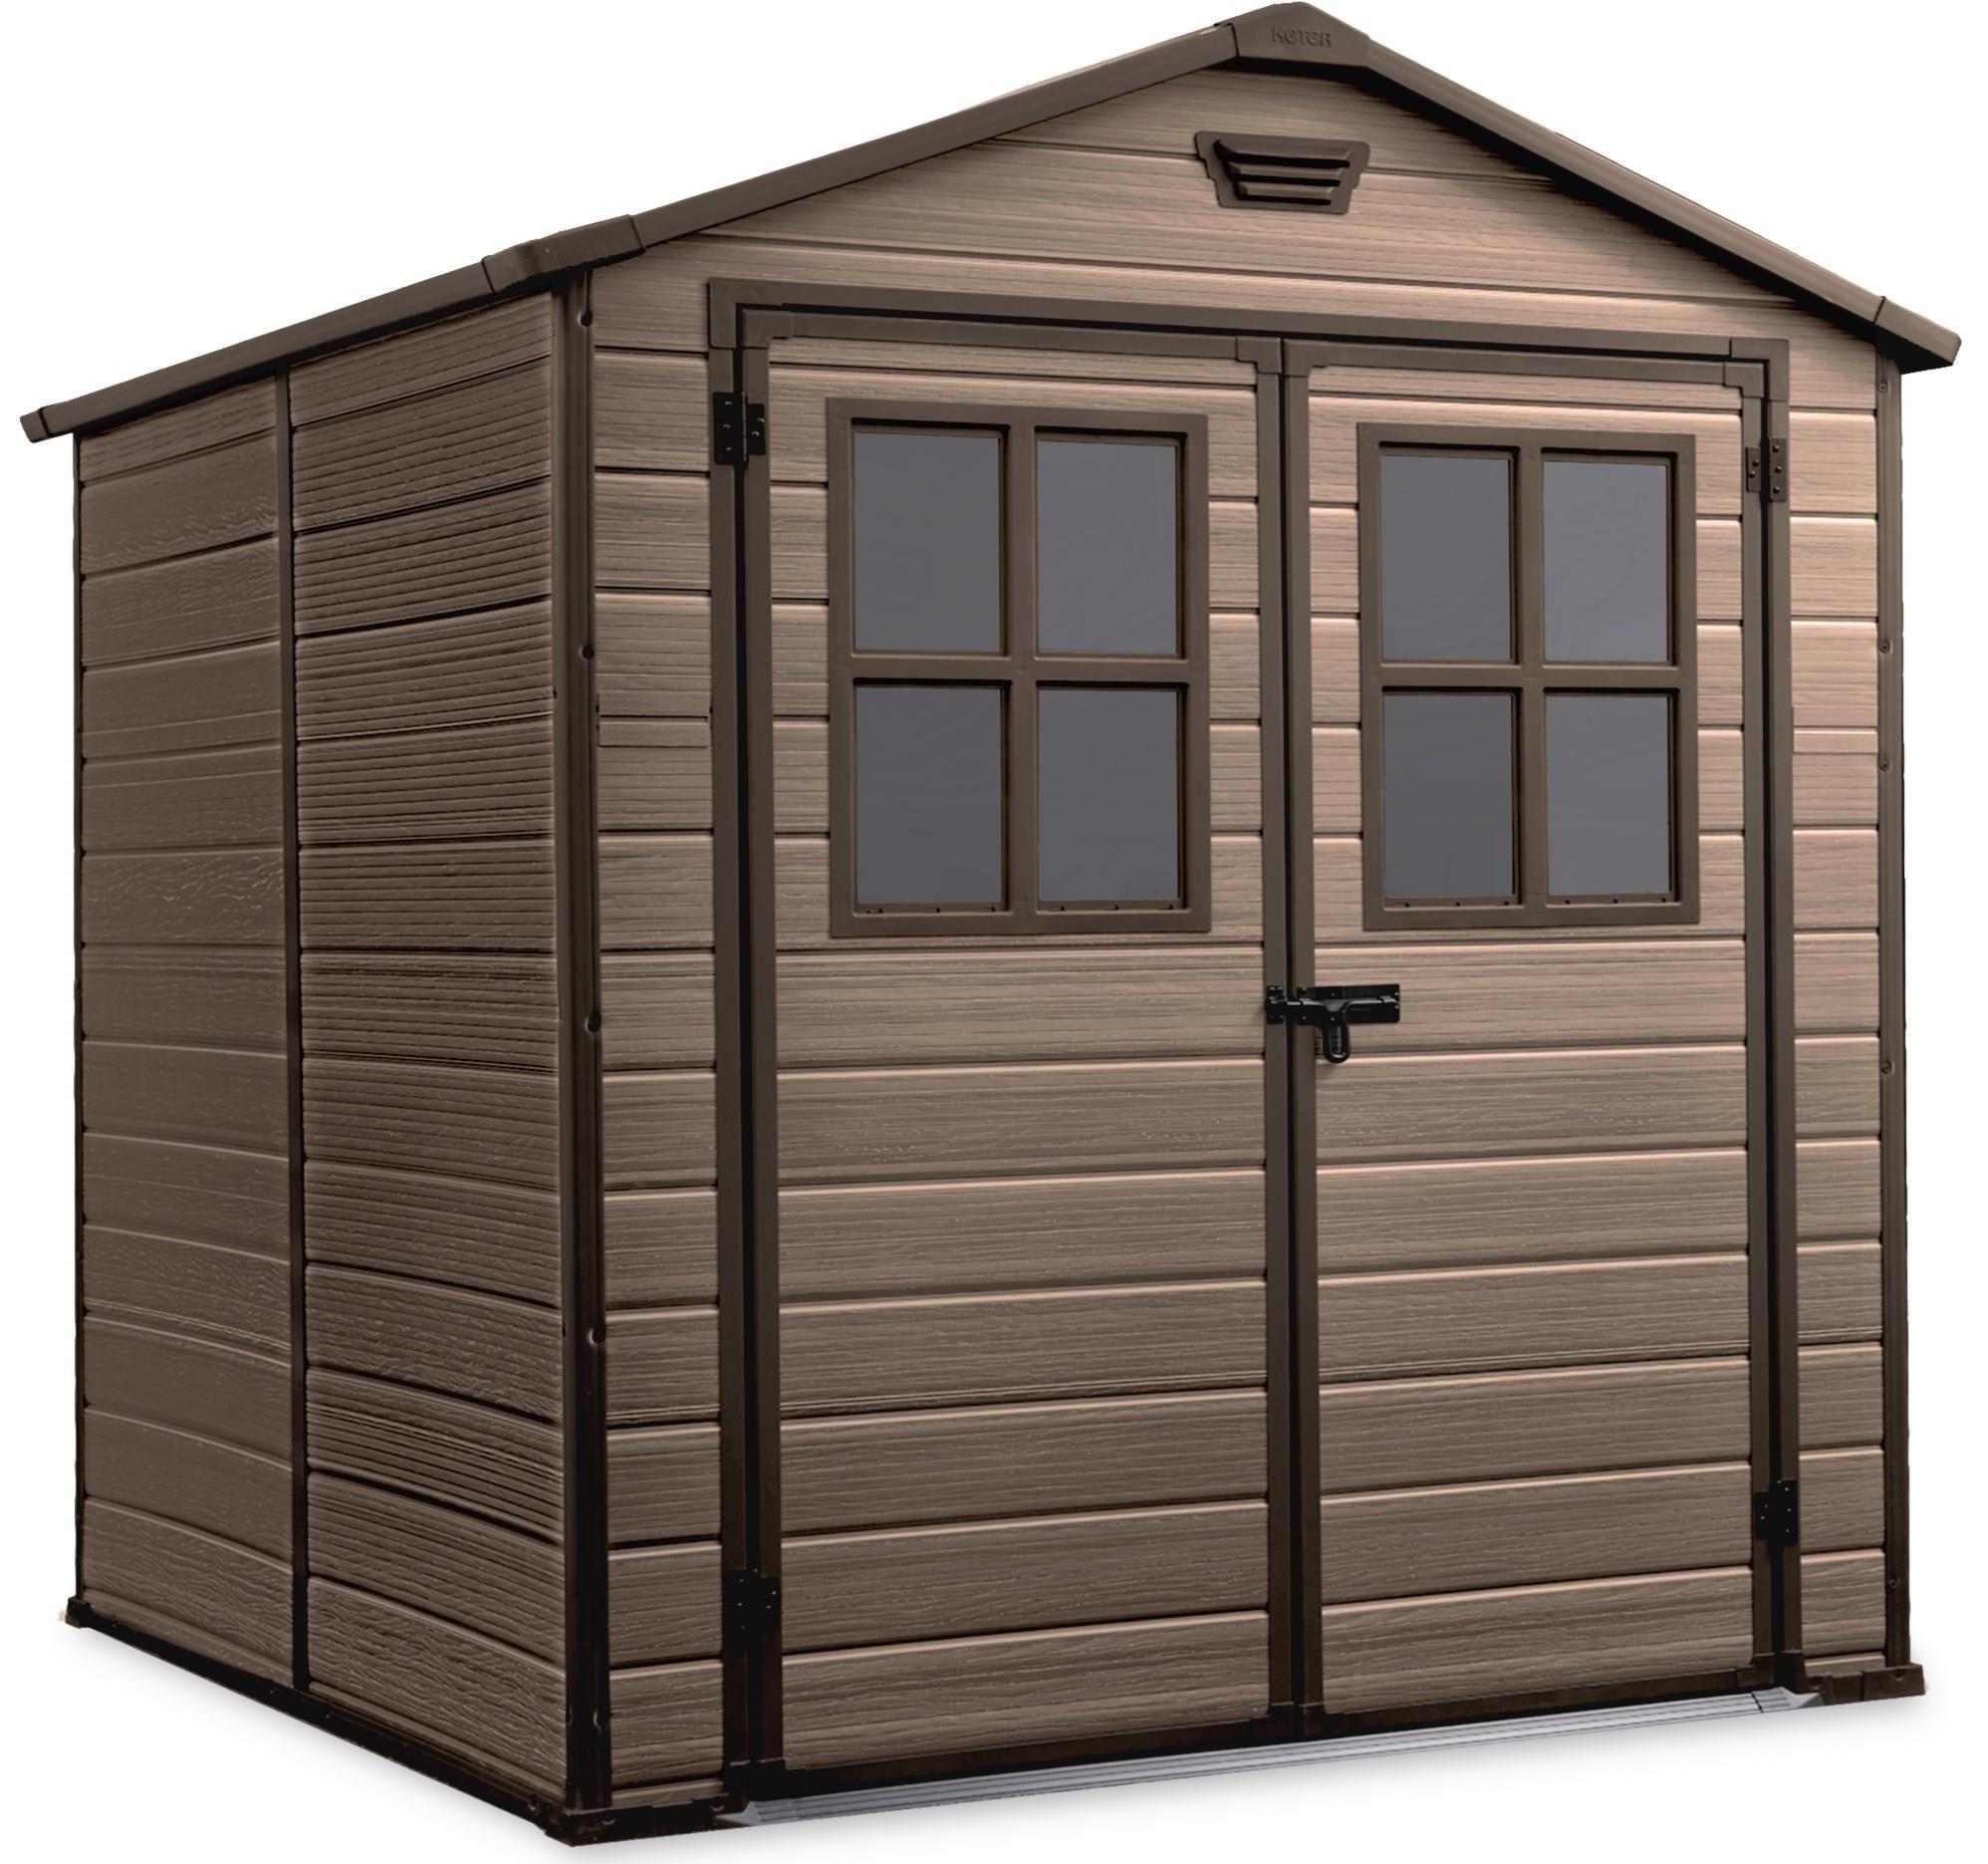 KETER Zahradní domek Keter SCALA 6x8 s okny 17202394 výprodej